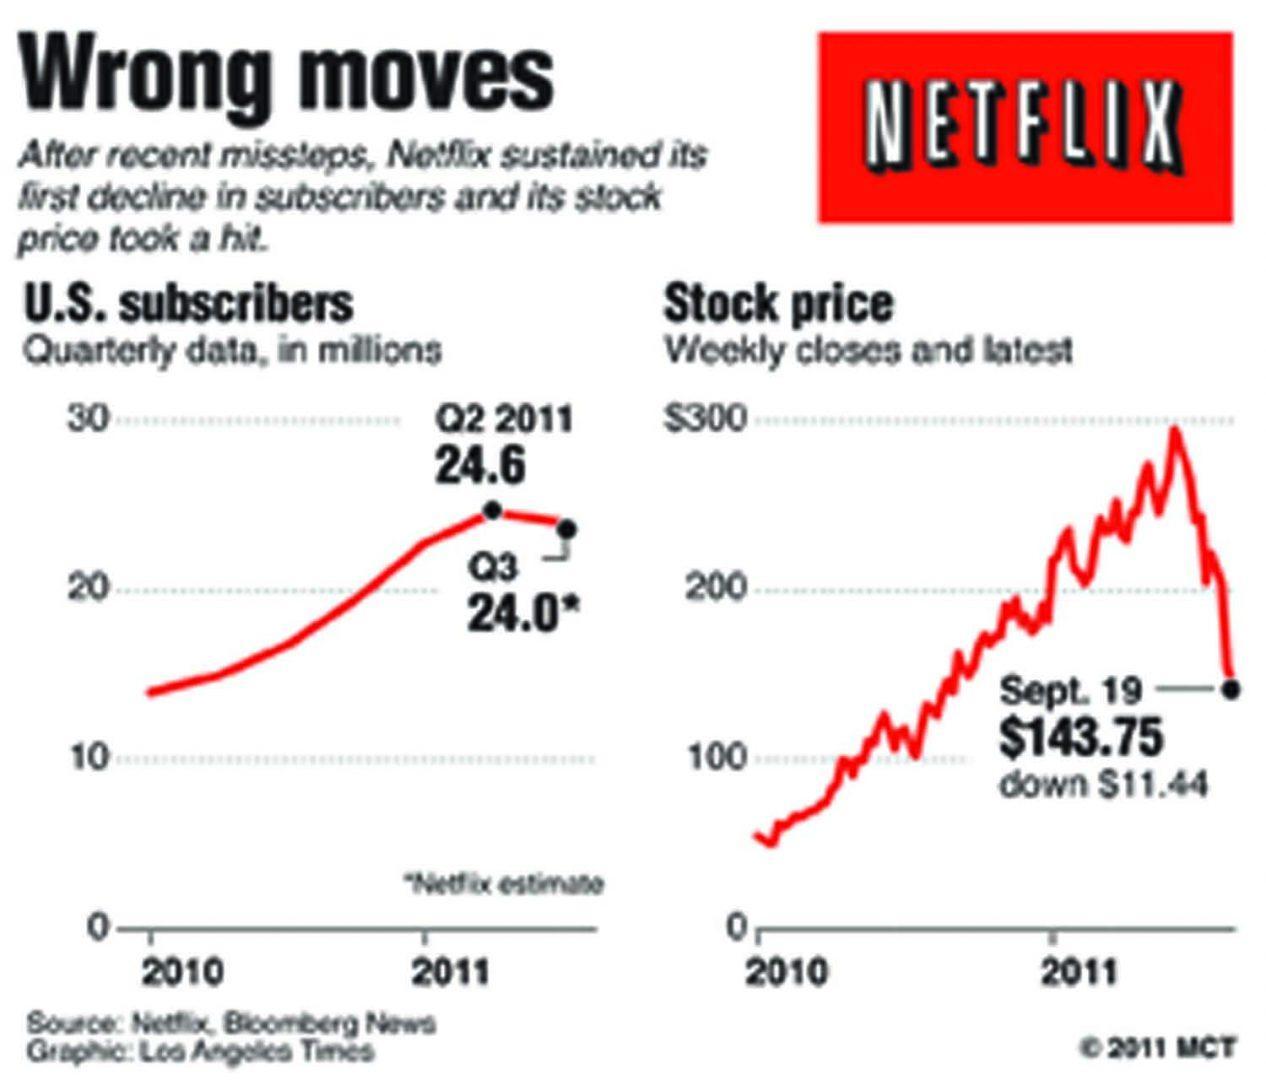 Netflix Beats Competition in Customer Satisfaction